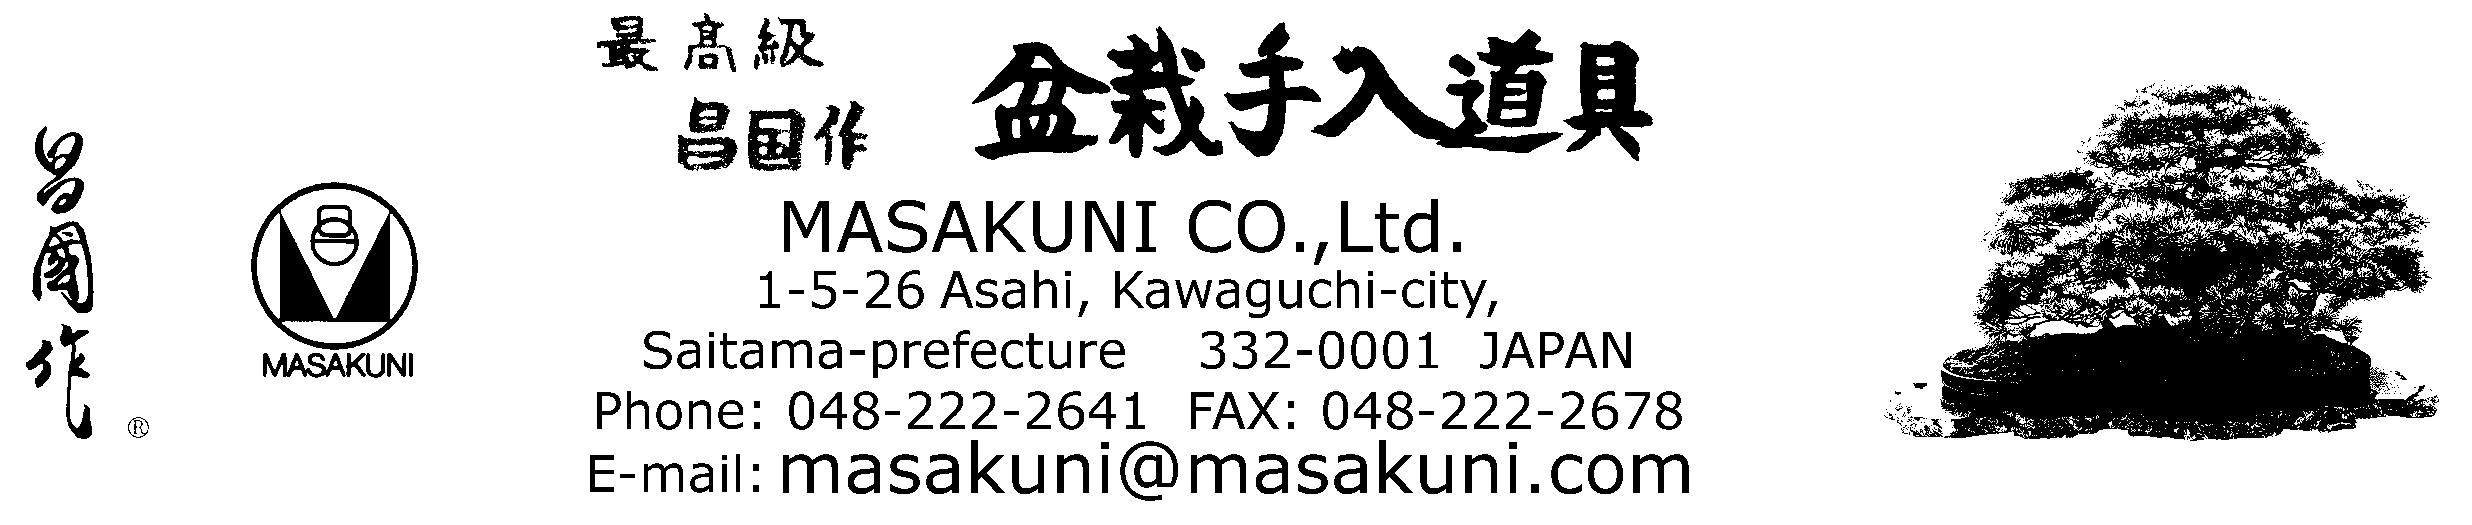 Price List 2005